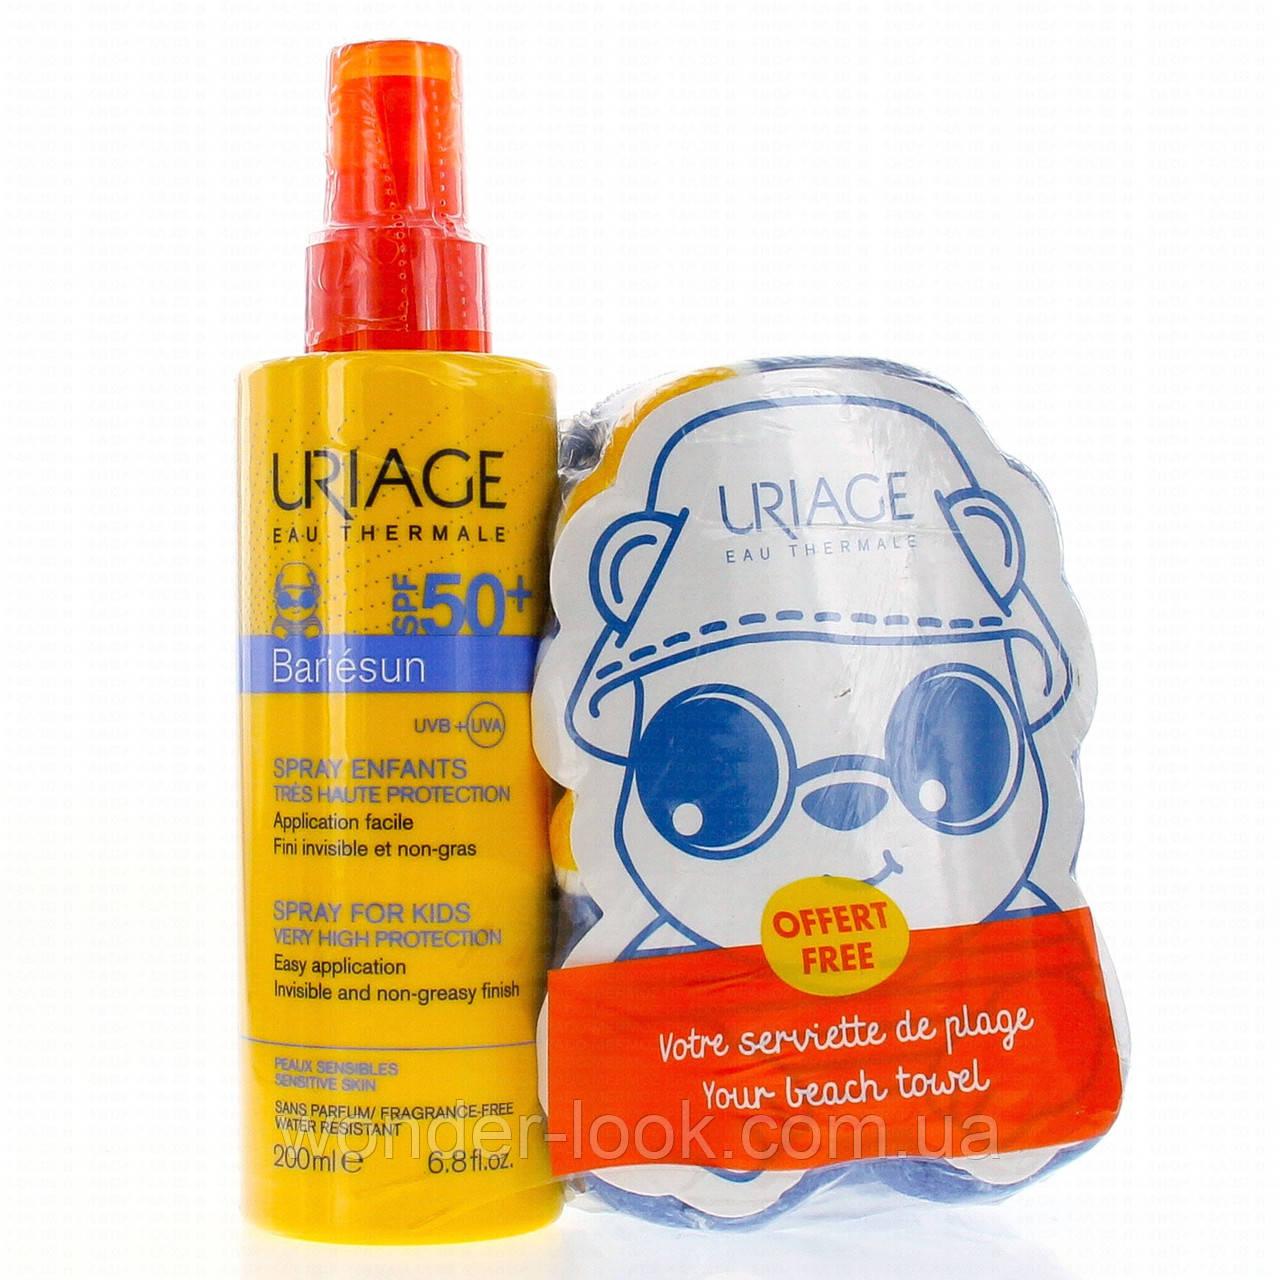 Дитяче сонцезахисне молочко Урьяж + дитячий рушник Uriage Bariésun Spray For Kids SPF 50+ 200ml